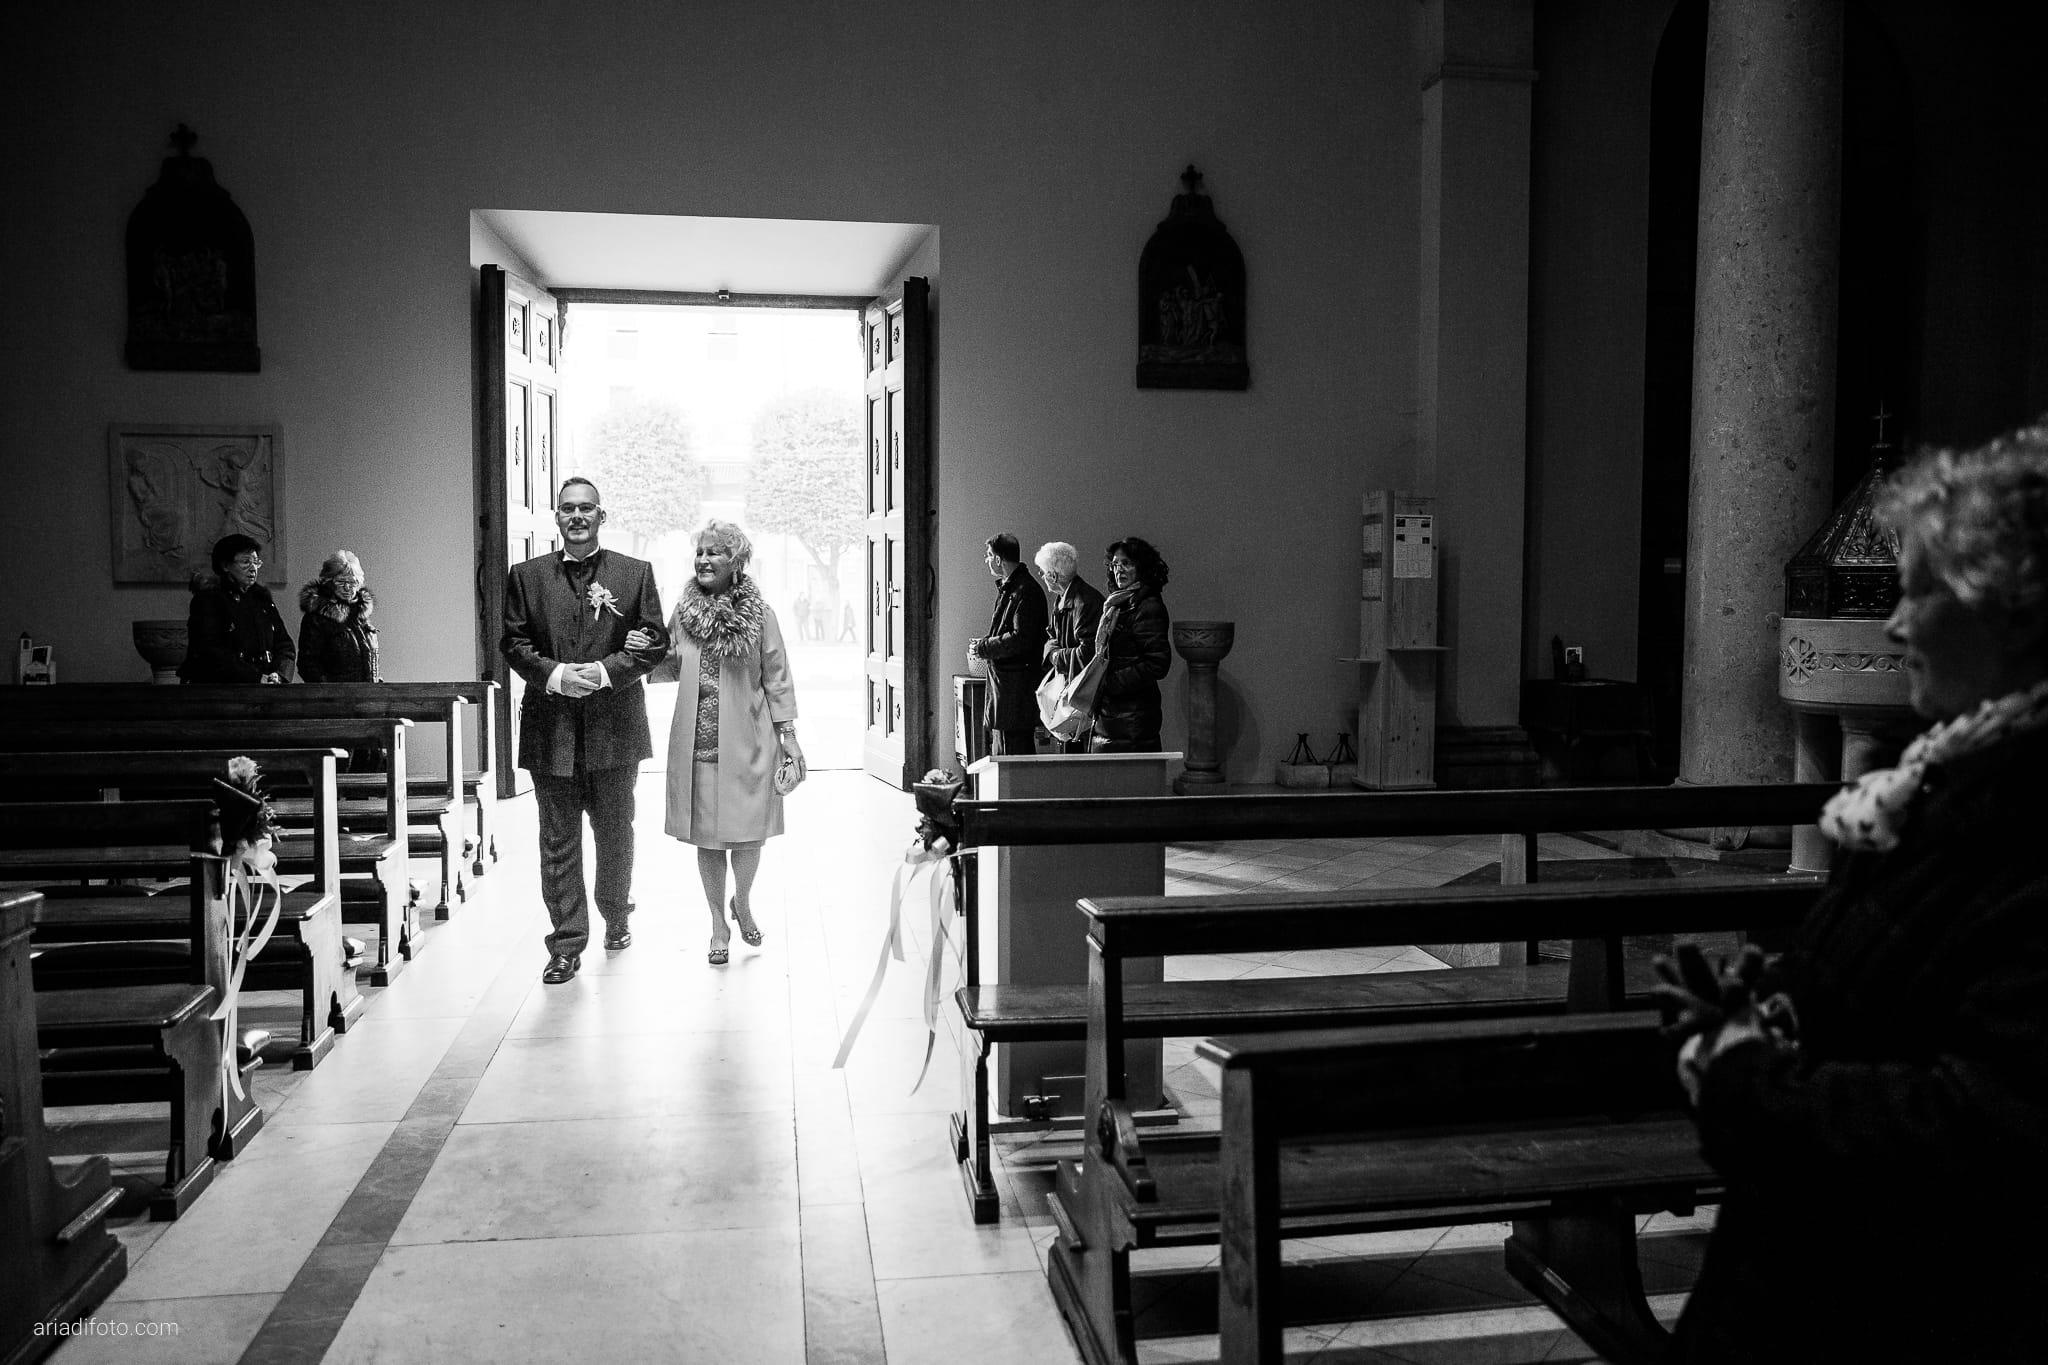 Elena Fabio Matrimonio Monfalcone Duomo di Sant'Ambrogio Castello Gorizia Rusjan Nova Gorica Slovenia cerimonia ingresso sposo